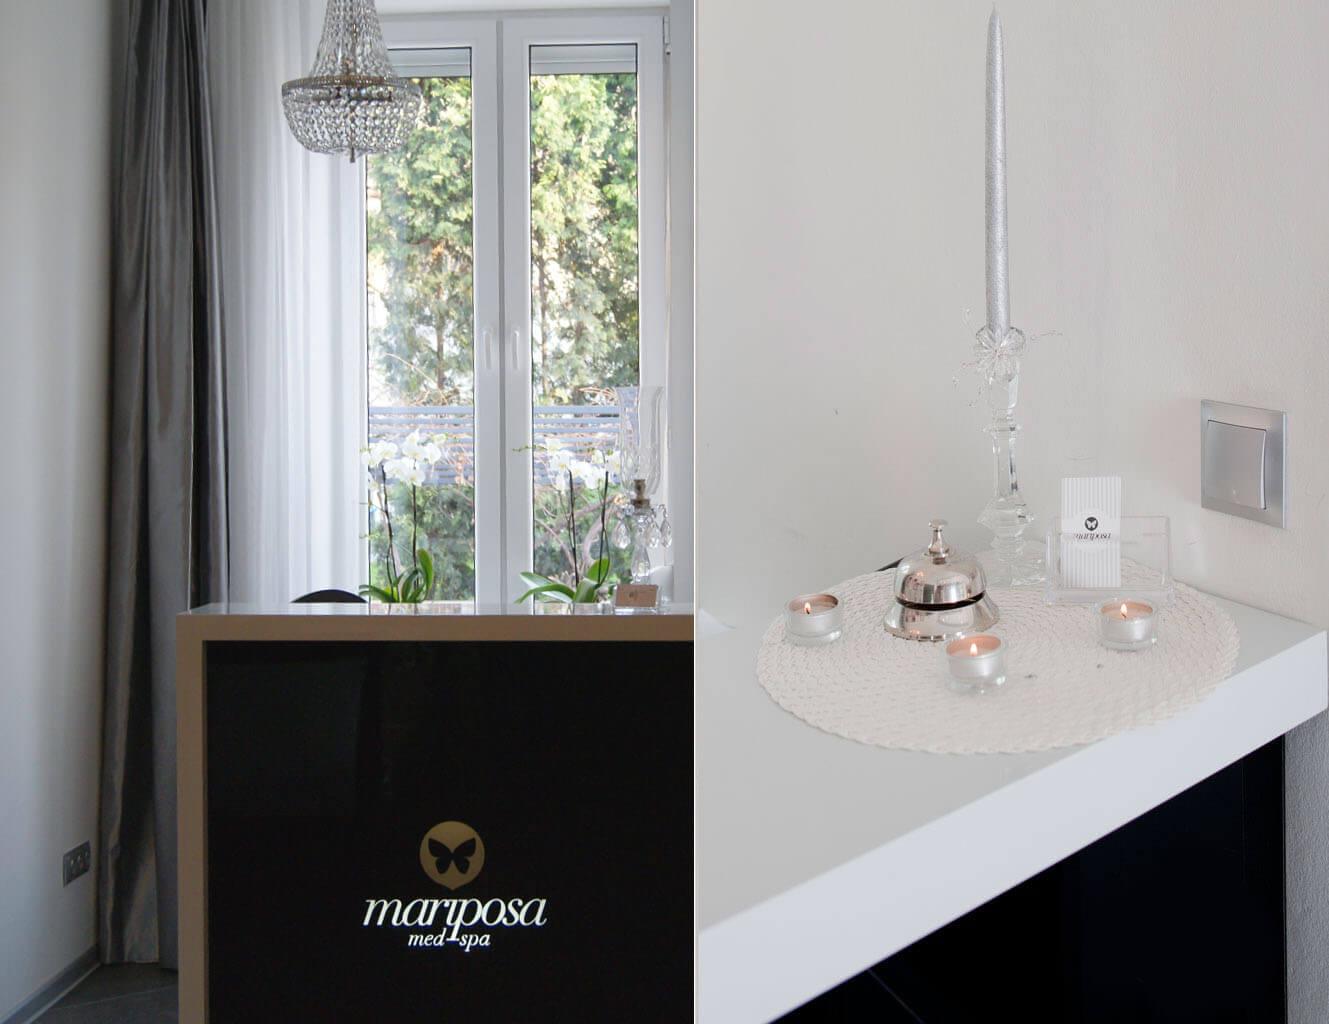 mariposa_4